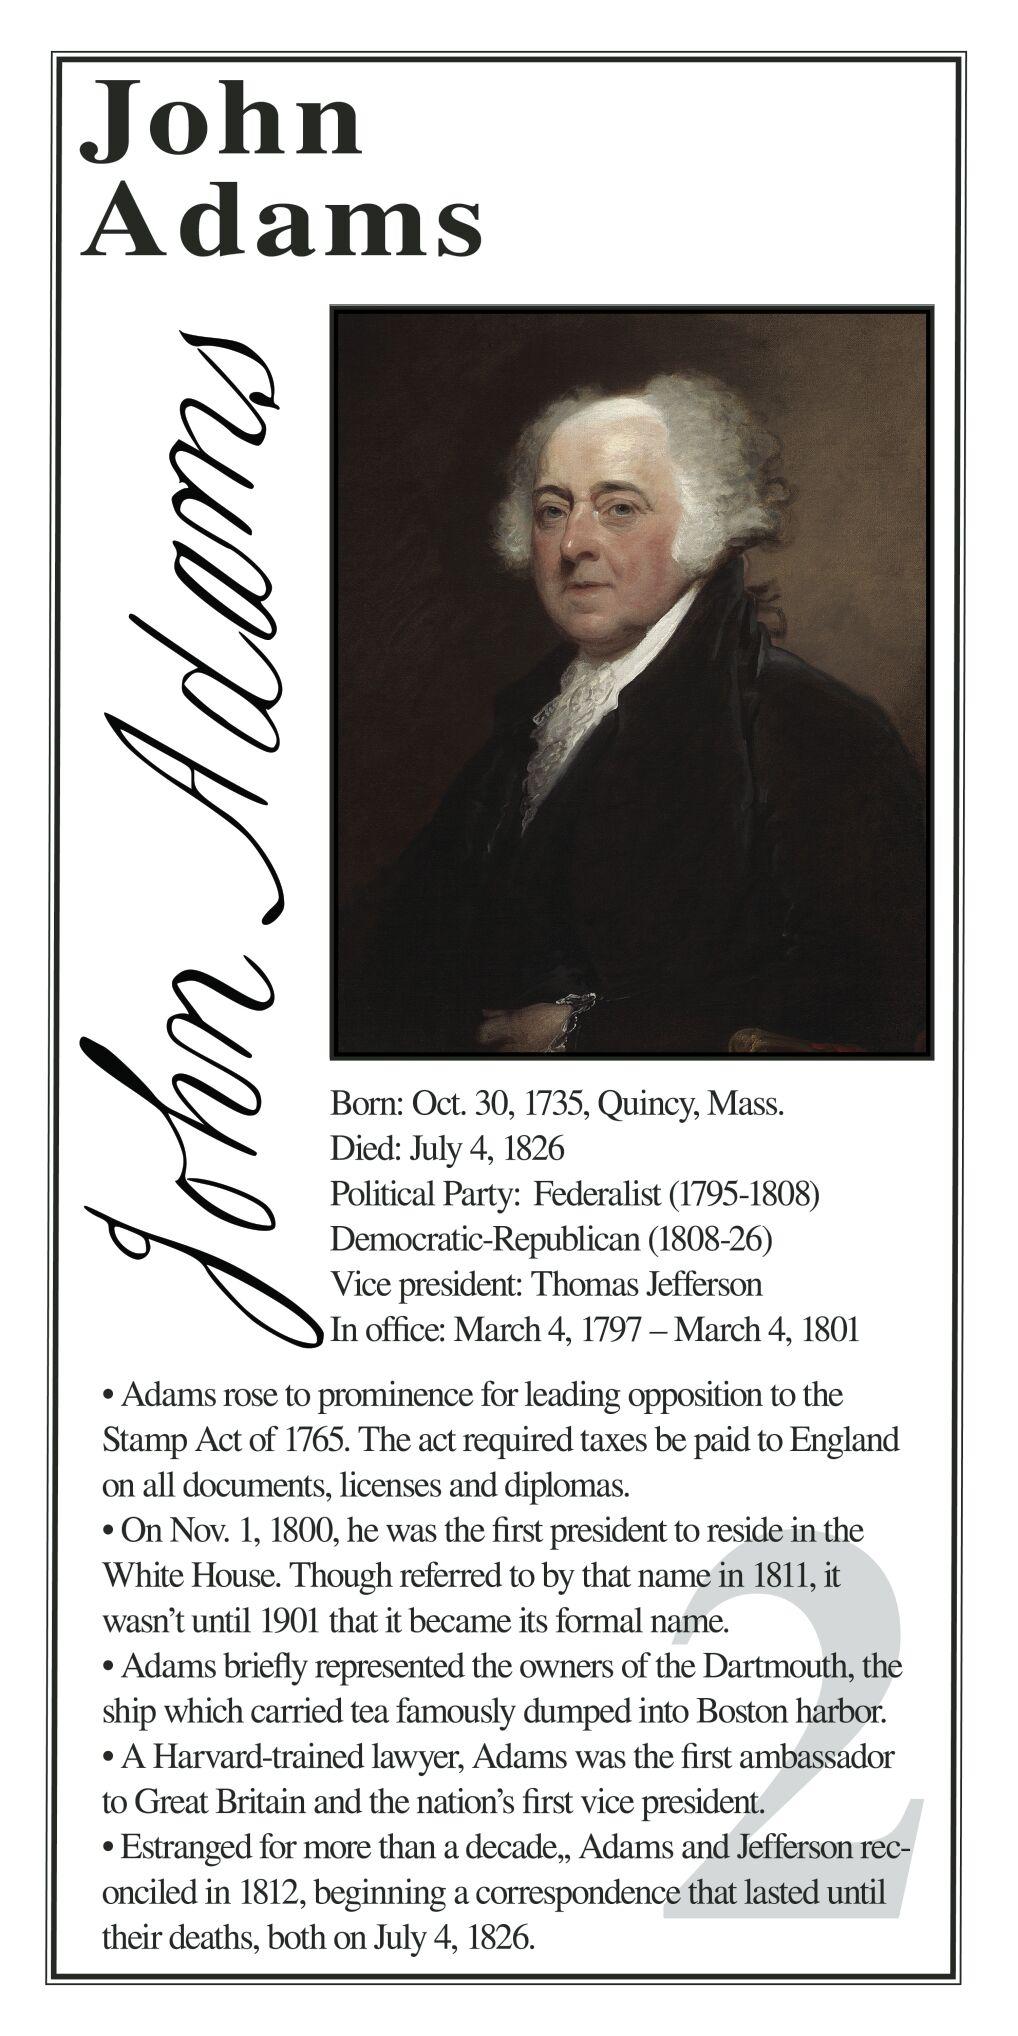 U.S. Presidents: John Adams